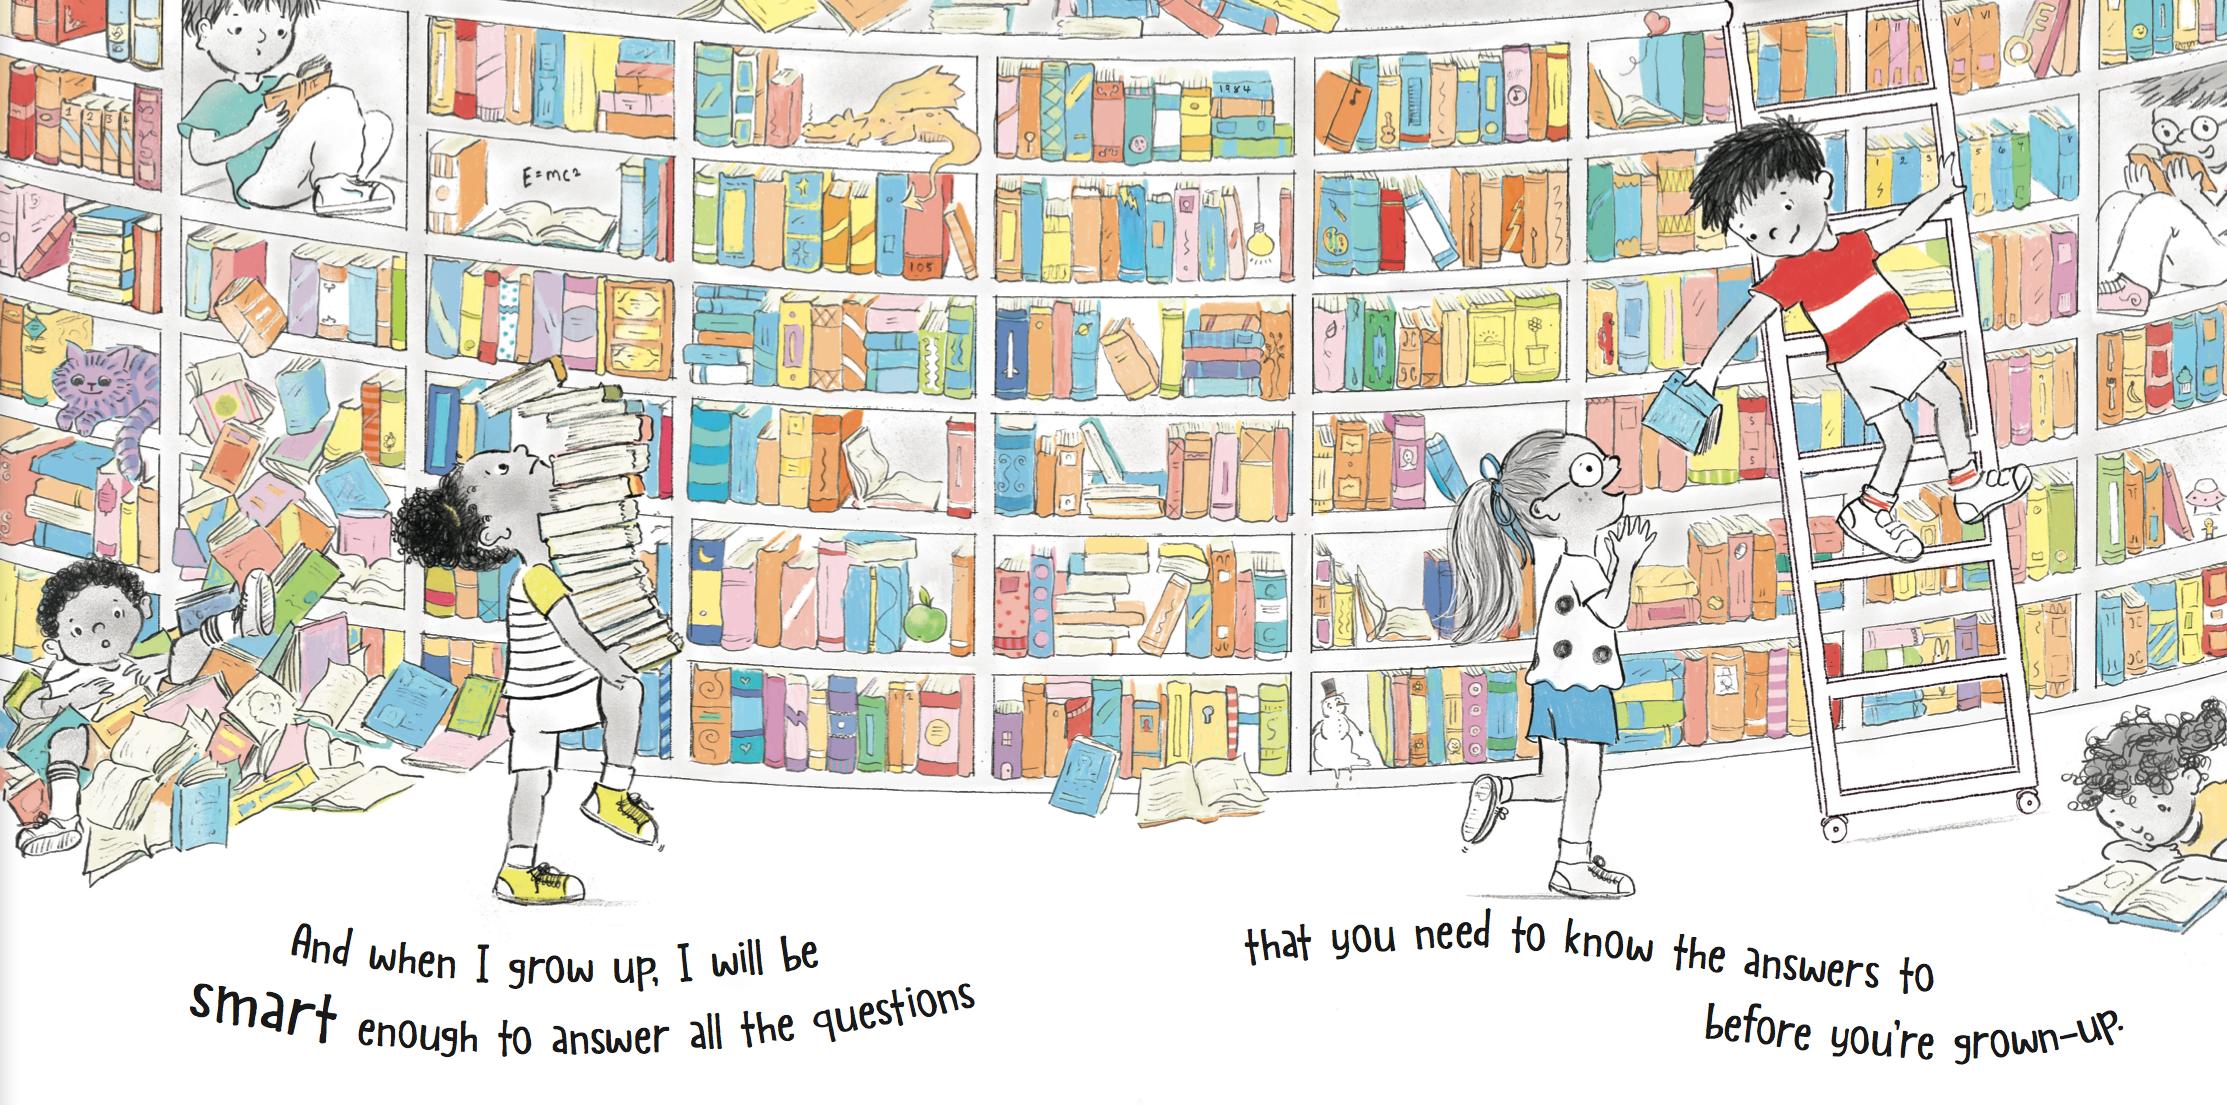 When I Grow Up, written by Tim Minchin